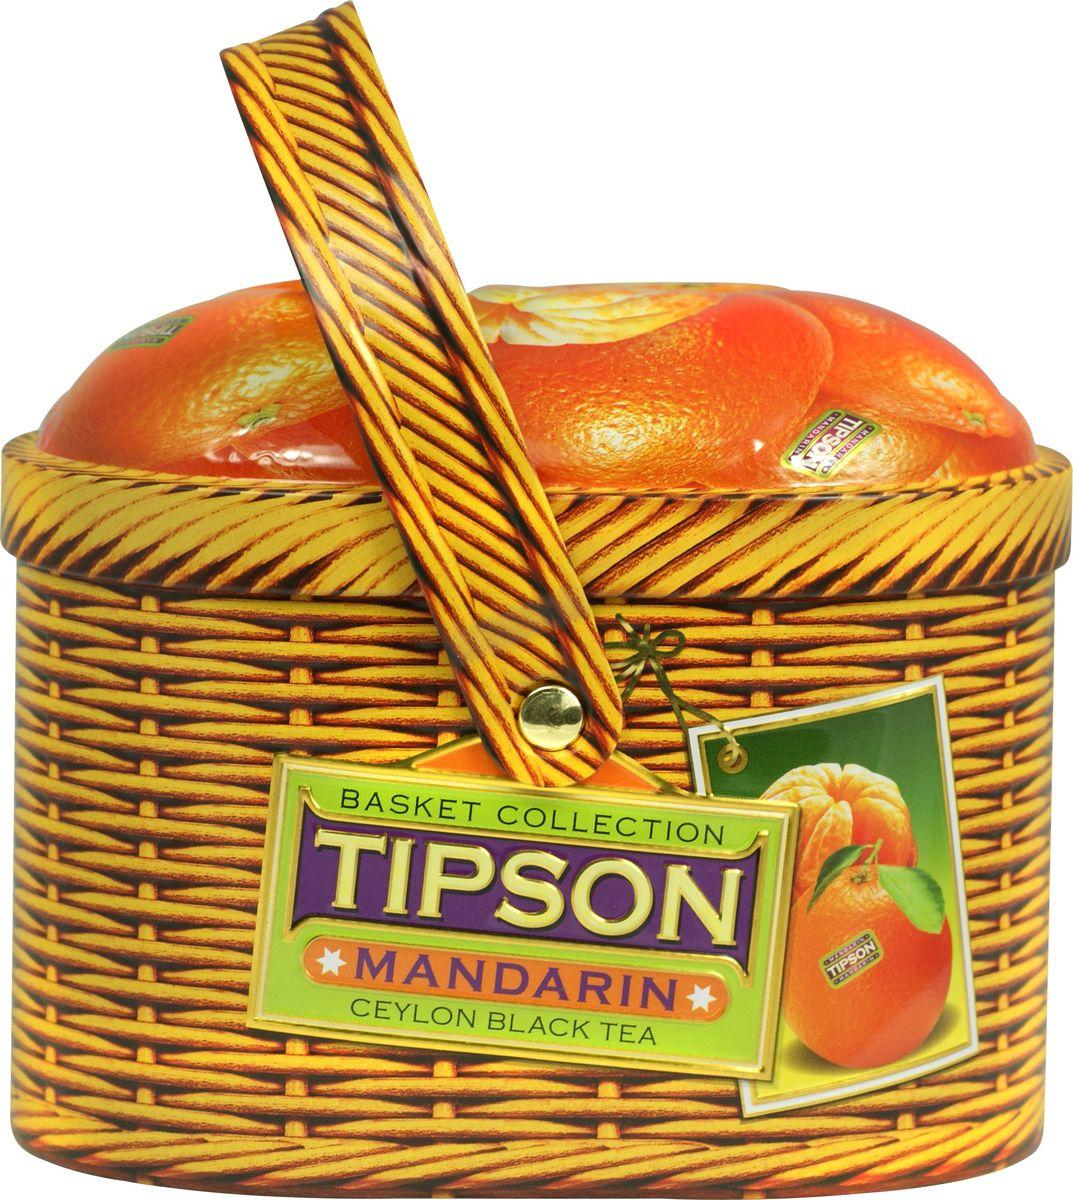 Tipson Mandarin черный листовой чай, 80 г дольче вита с рождеством христовым черный листовой чай 170 г